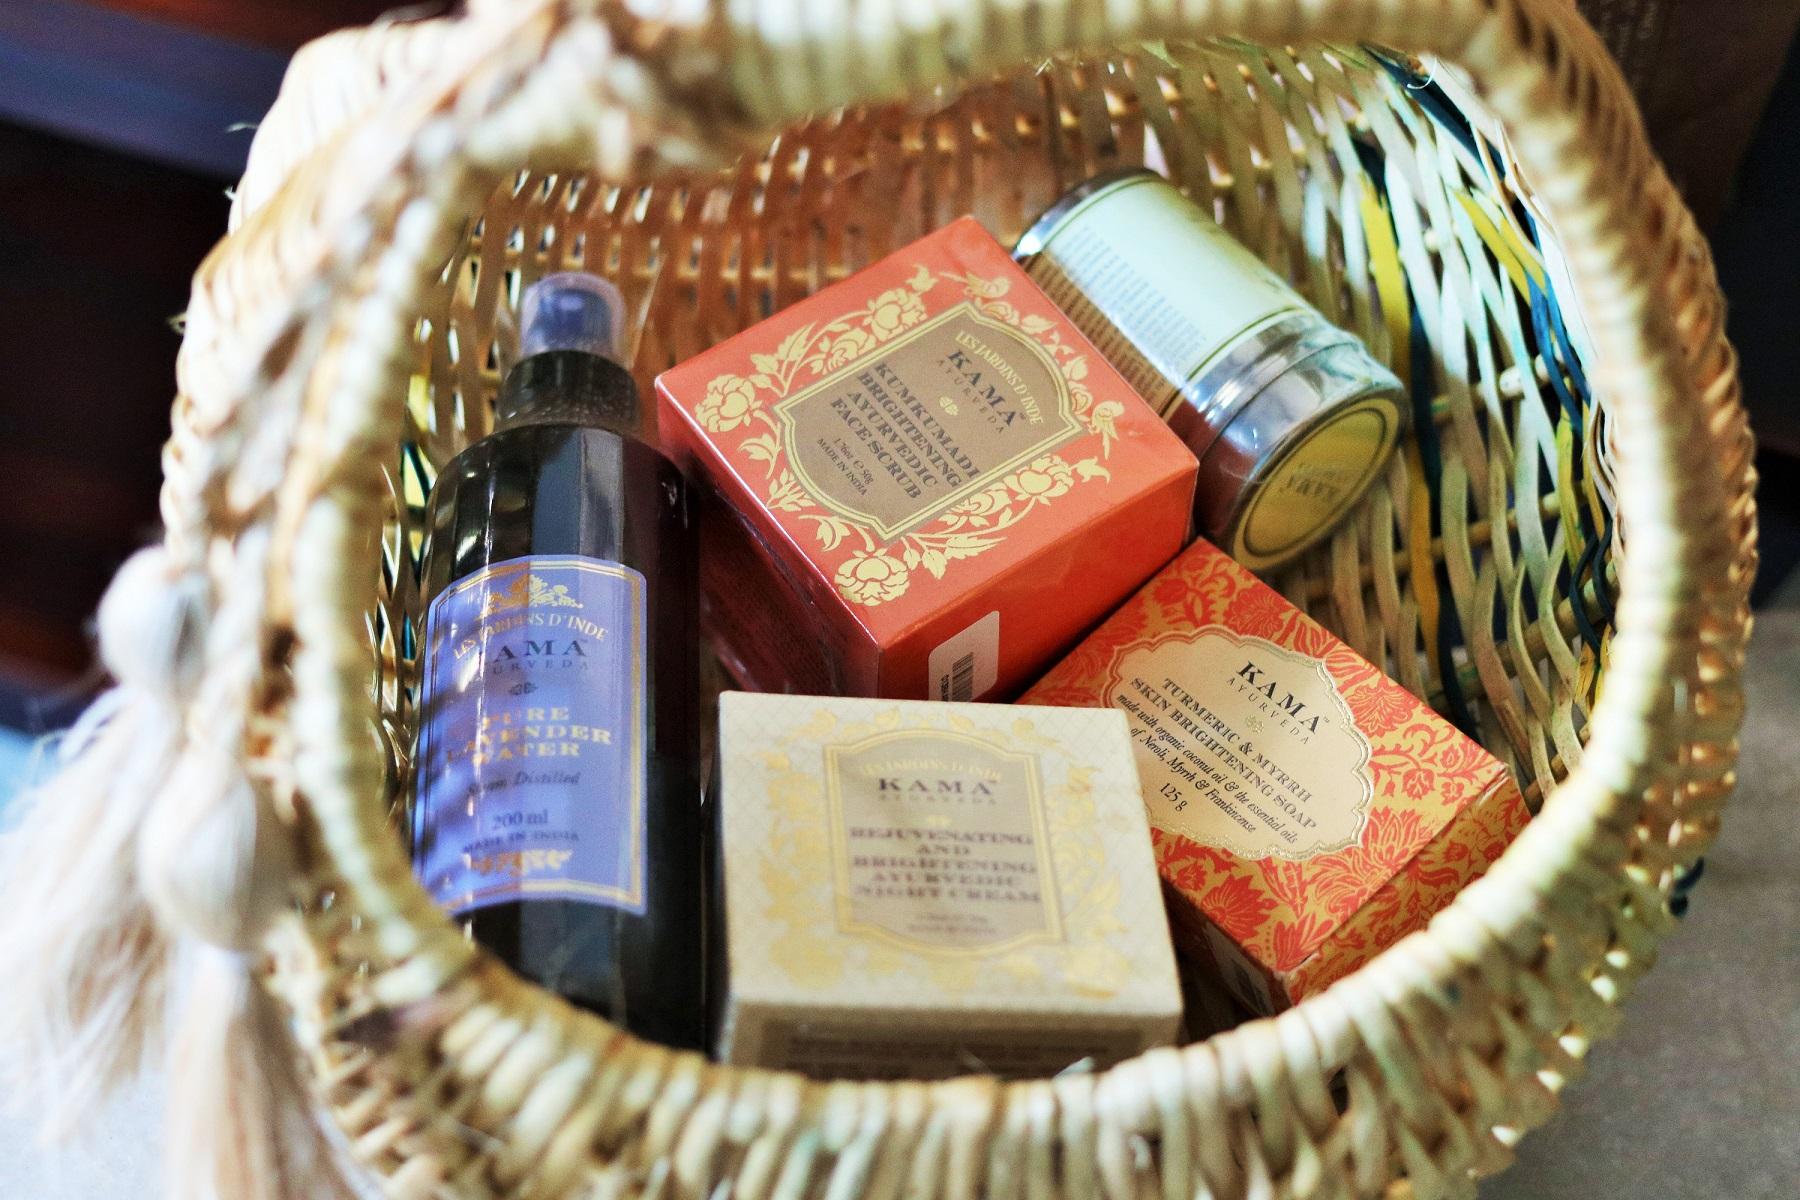 Skincare Routine With Kama Ayurveda